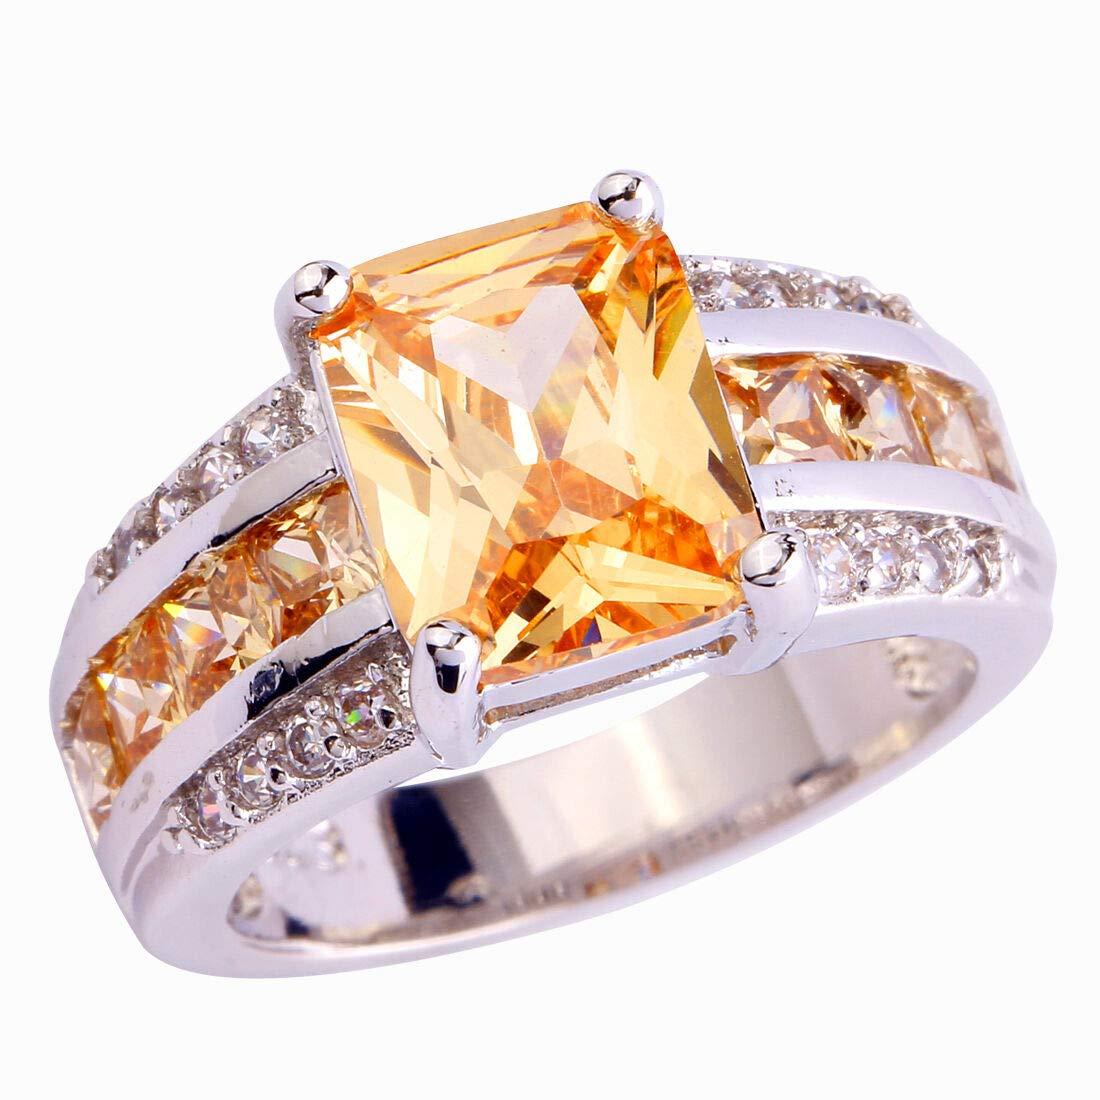 9 The Sun Jewelry Morganite White Topaz Gemstone Fashion Jewelry Women Silver Ring Size 7 8 9 10